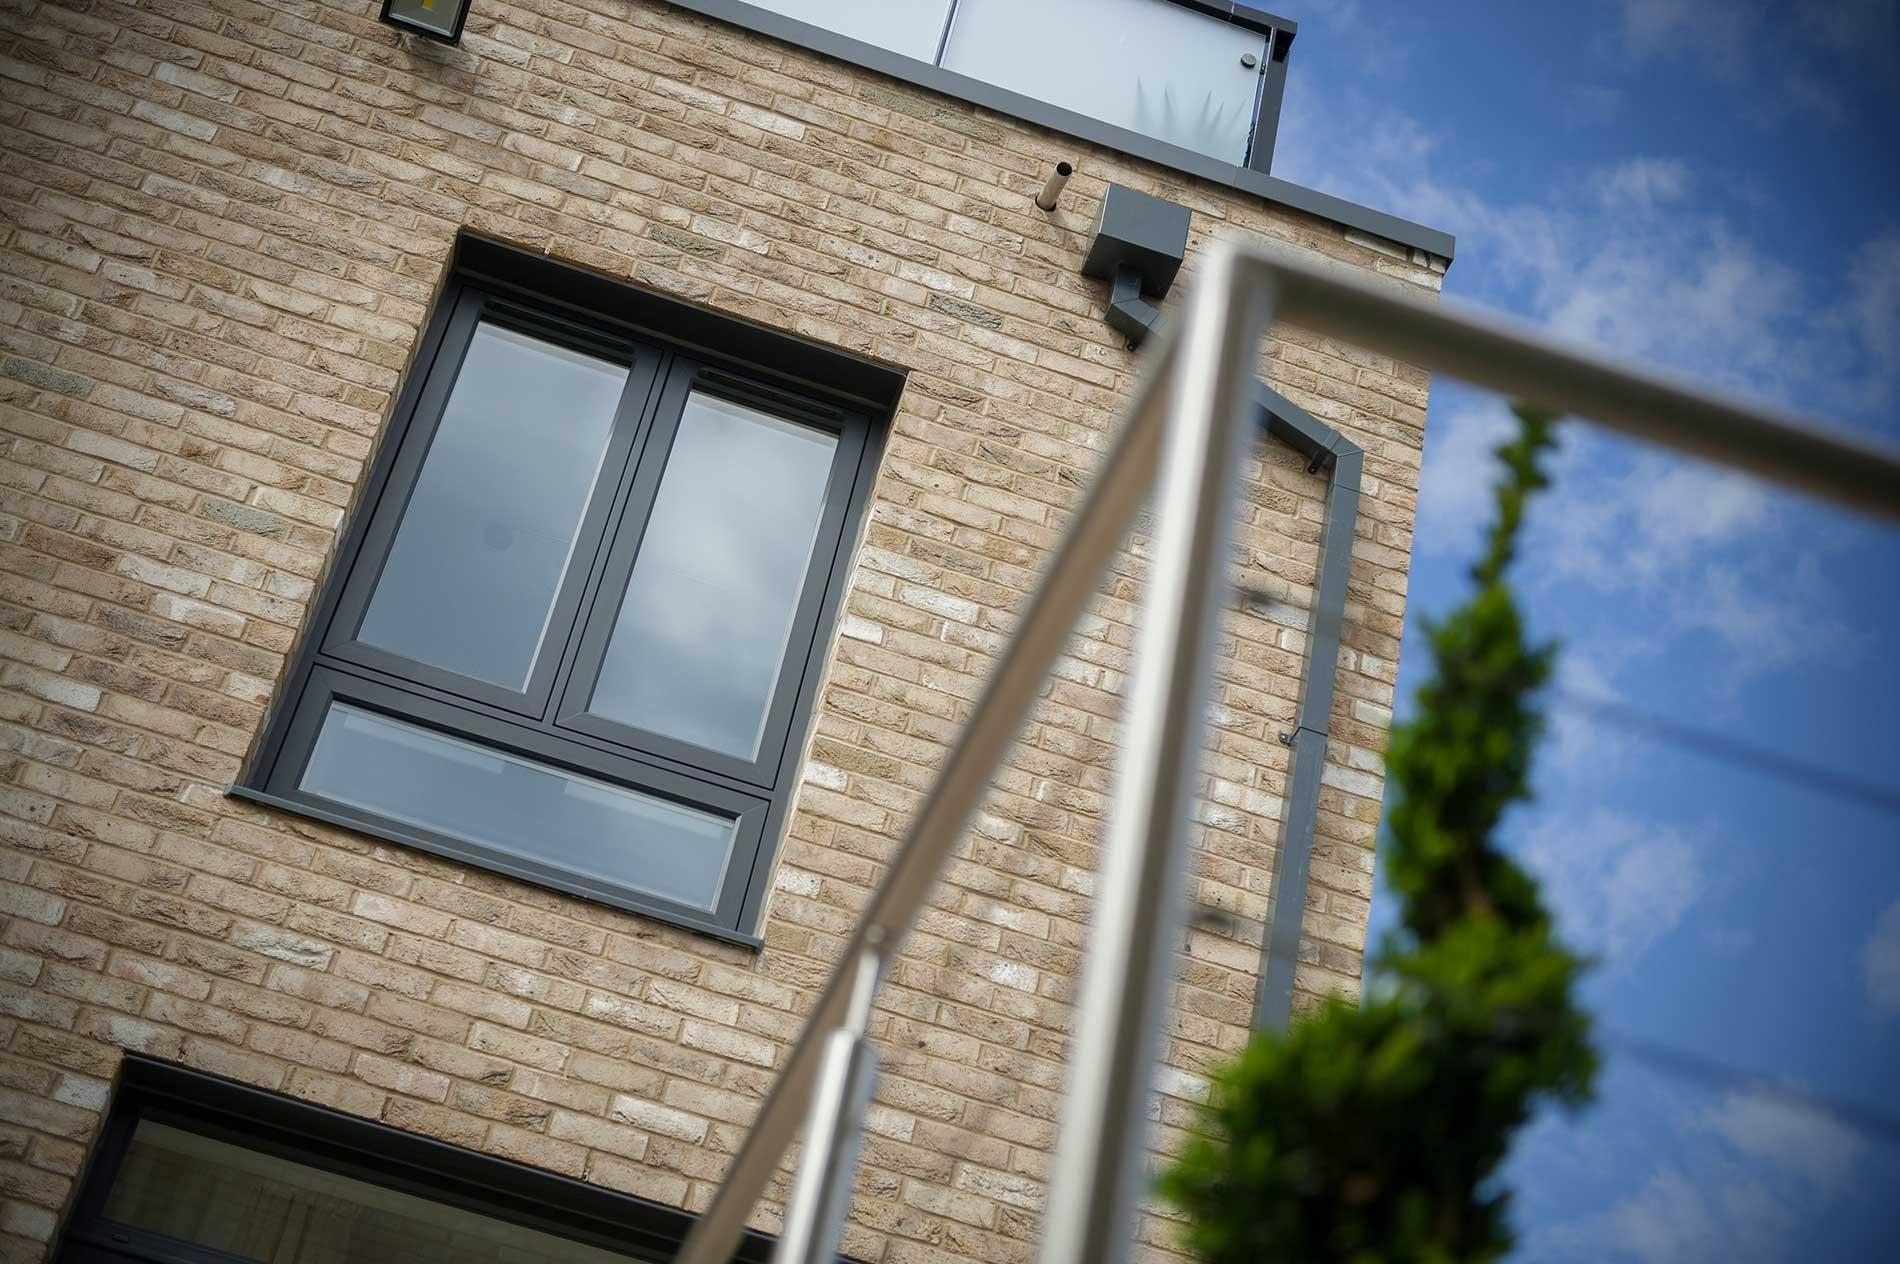 Flush Residence 9 windows Prices, Hampshire